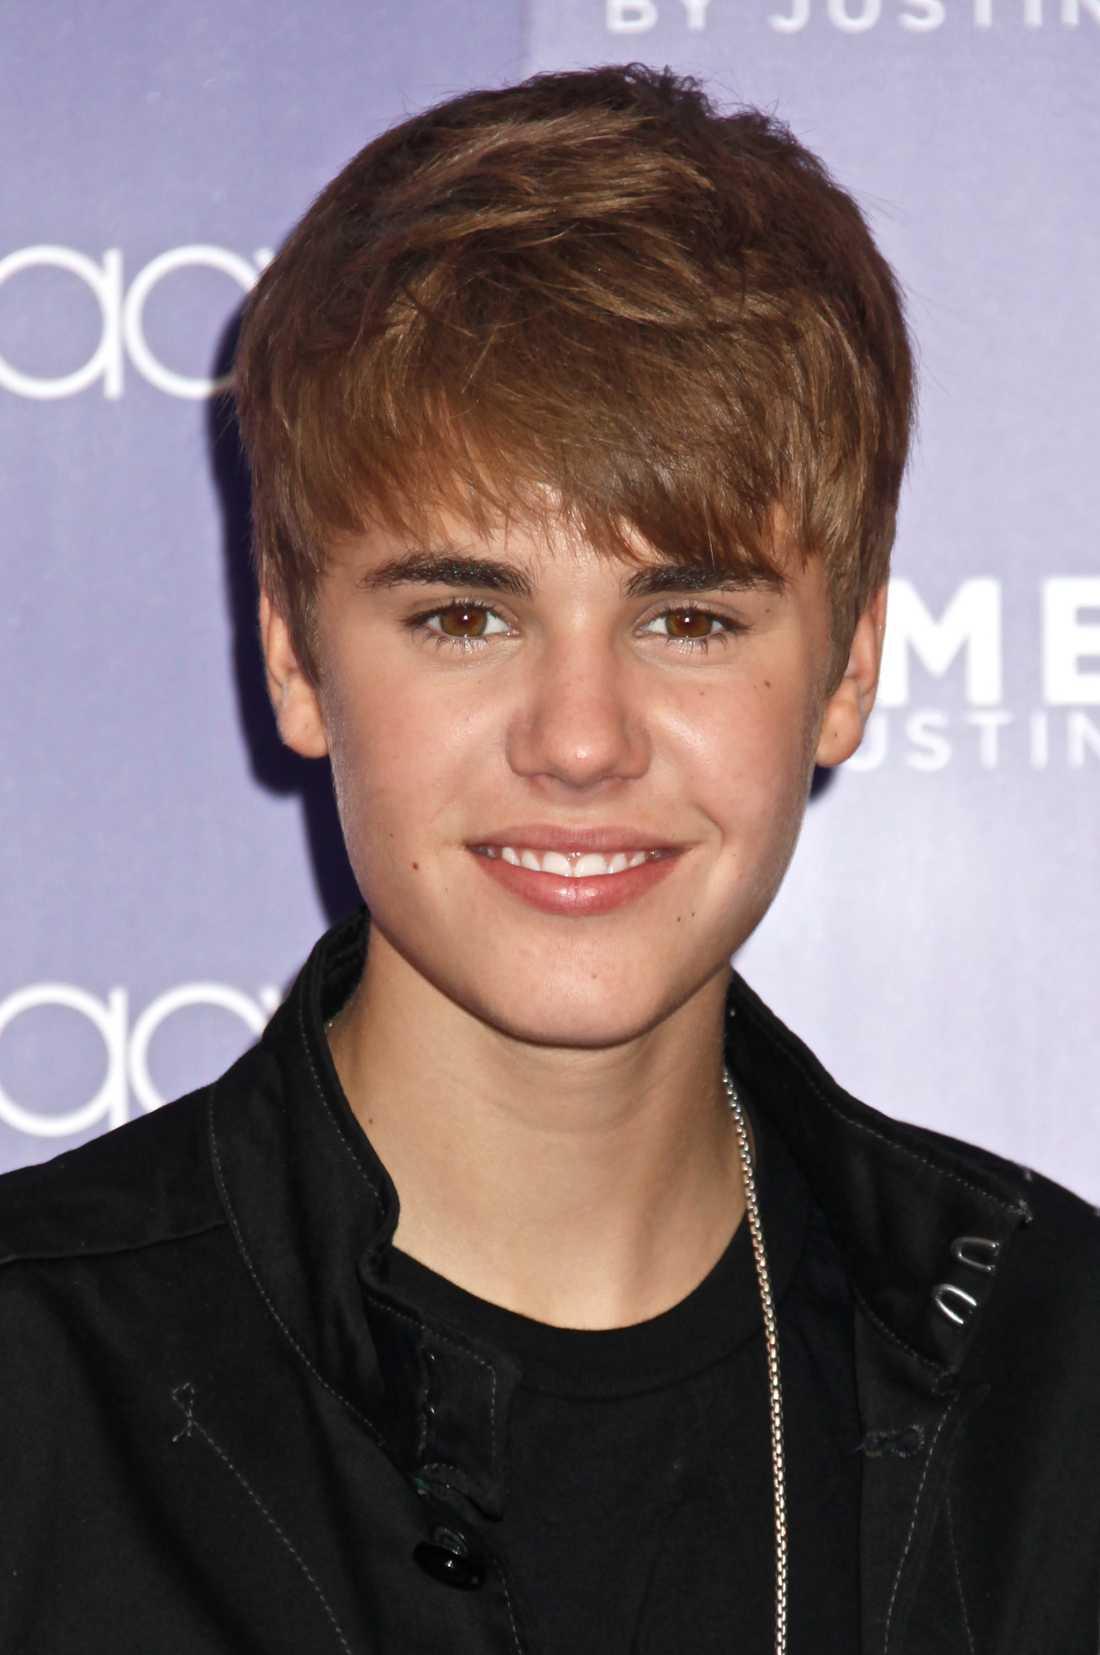 2. Justin Bieber 13,3 miljoner